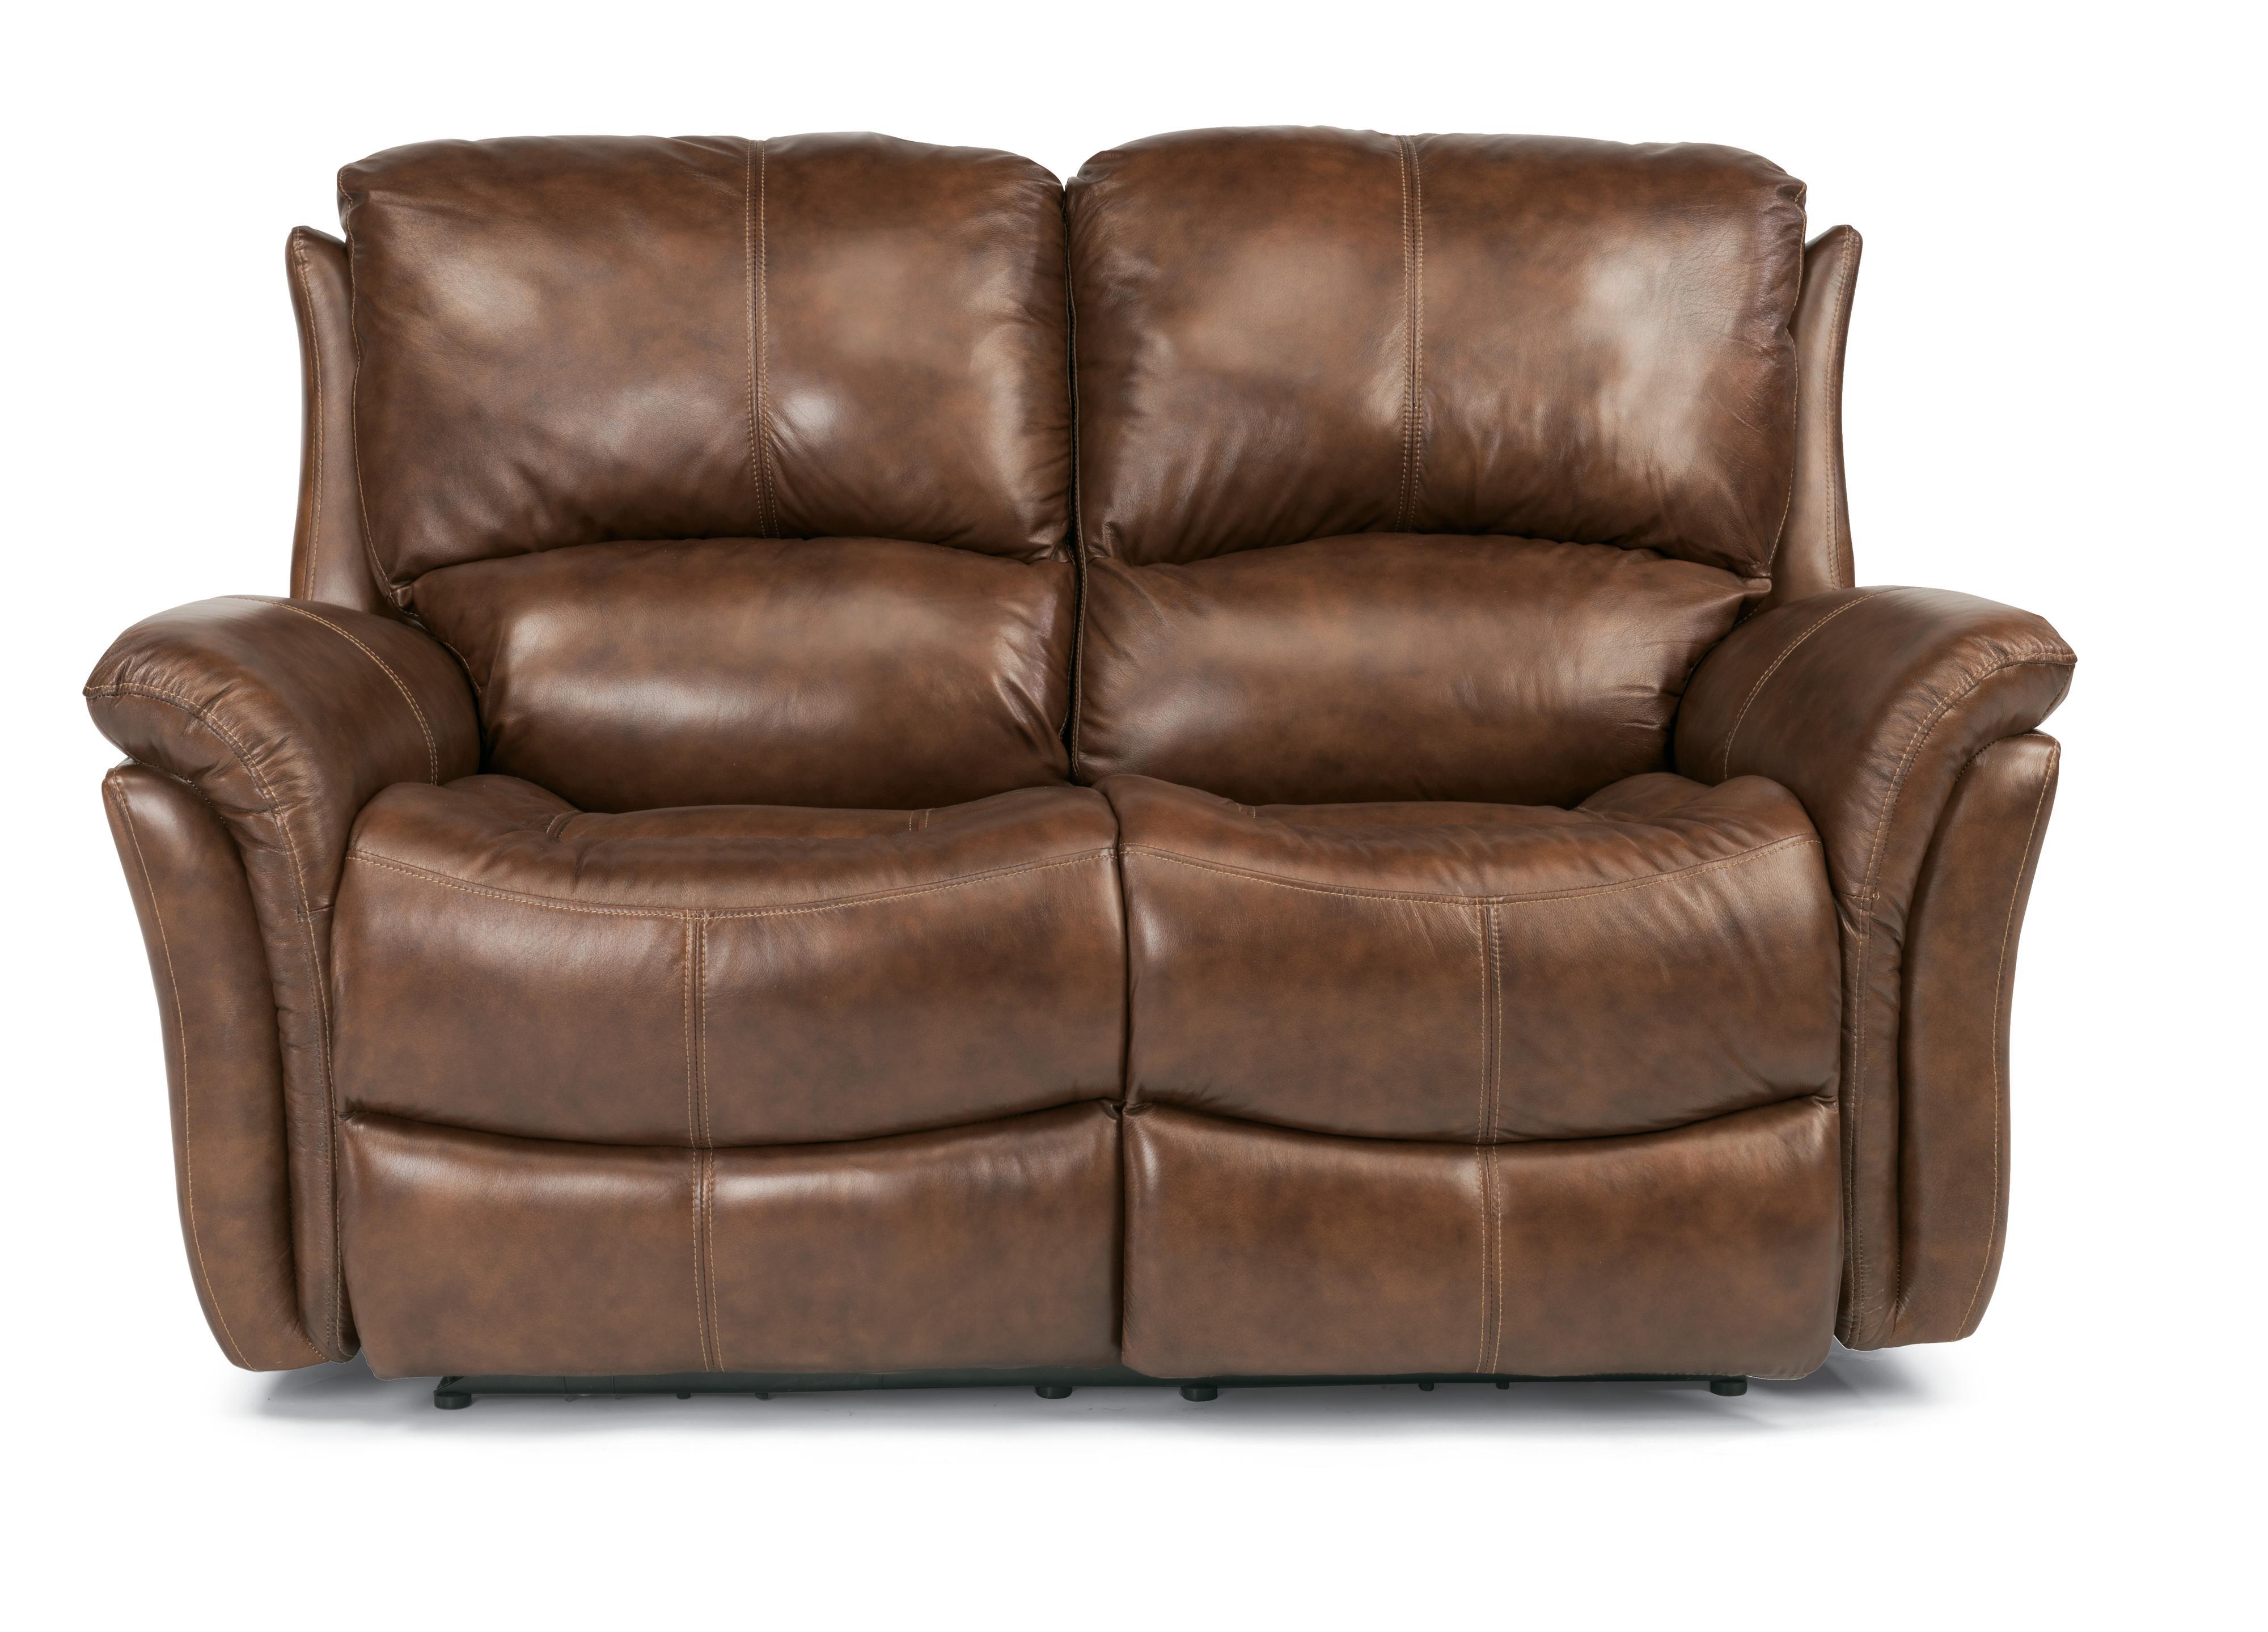 flexsteel chair prices sequin covers latitudes dominique 1445 60p casual reclining